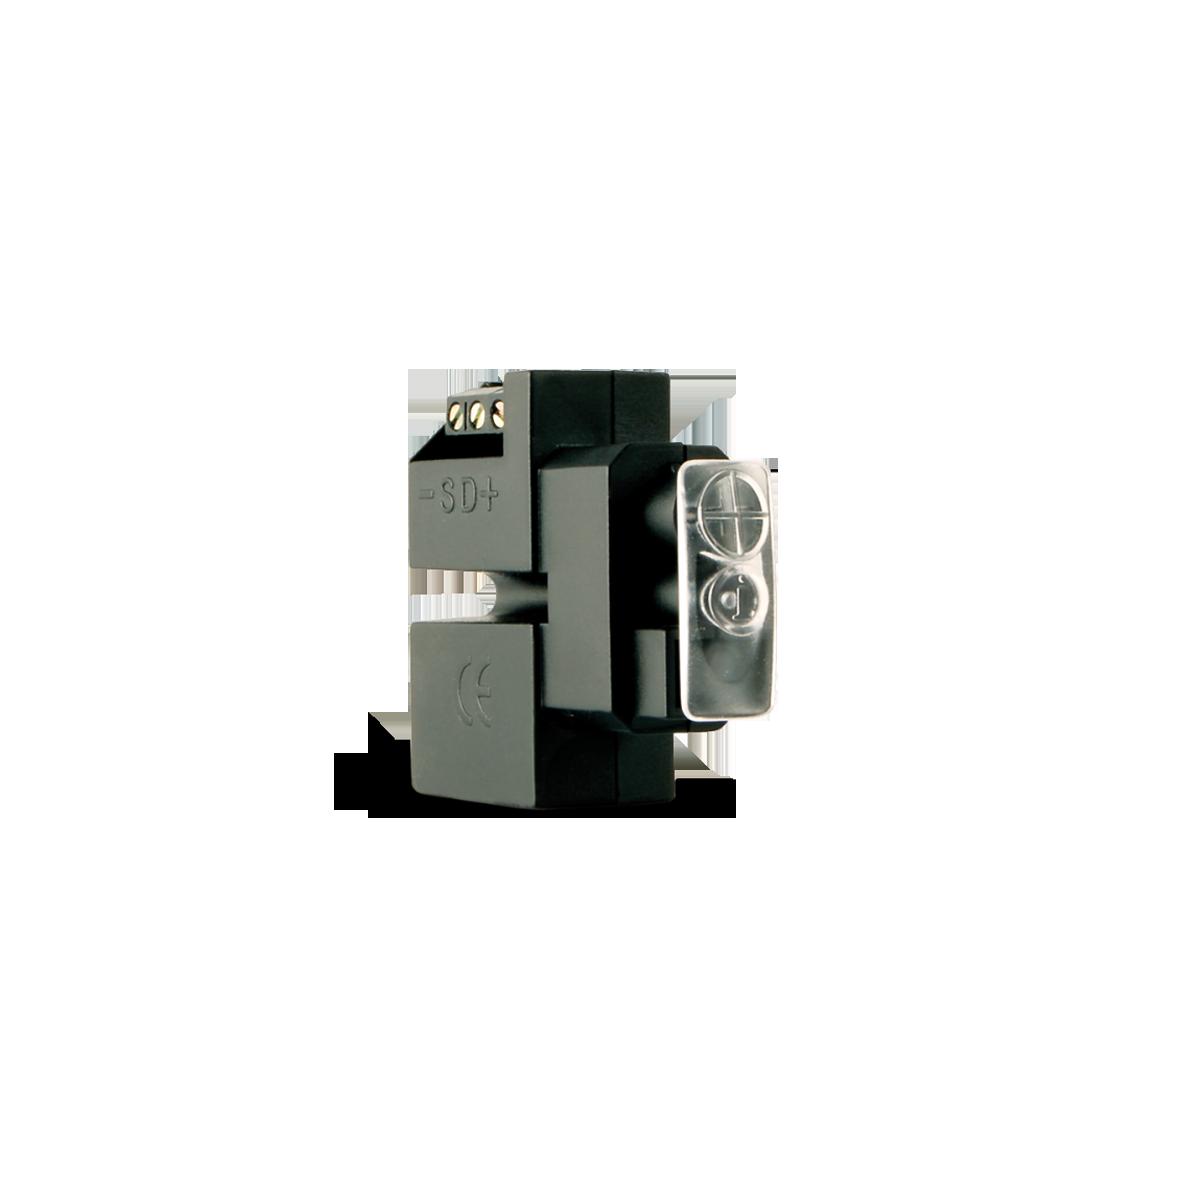 NBY/X Leitor Proxi. de Embutir RFID INIM